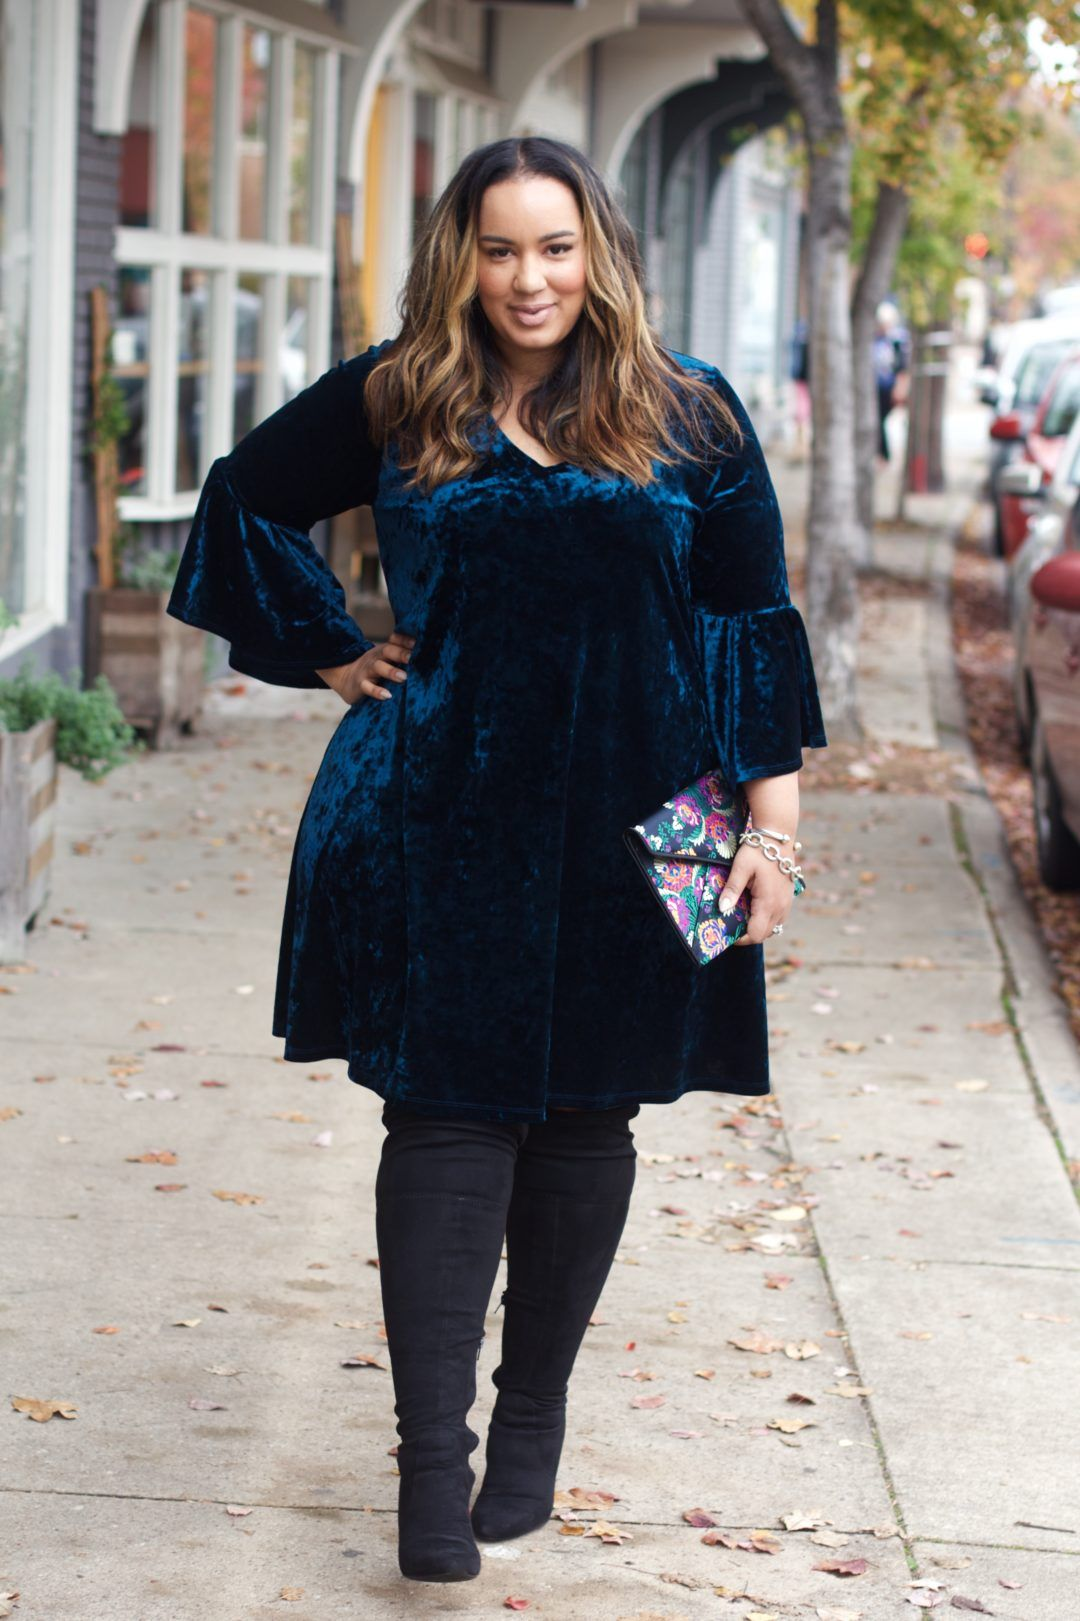 074f4fbf39f Plus Size Fashion for Women - Beauticurve  plussize